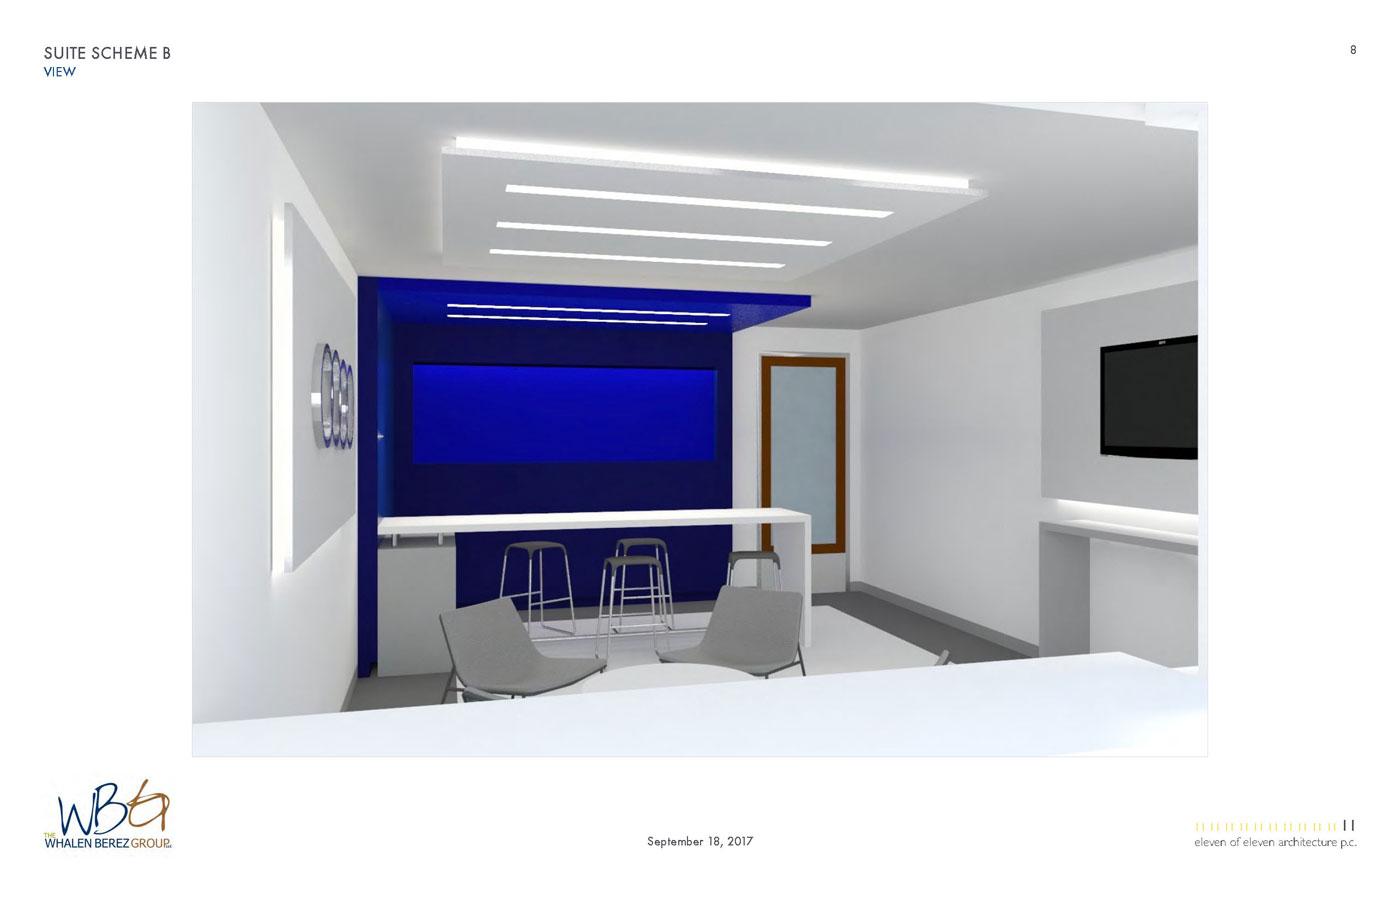 red-bull-arena-suites-bulls-corner-170918+REDBULL+LR_Page_08